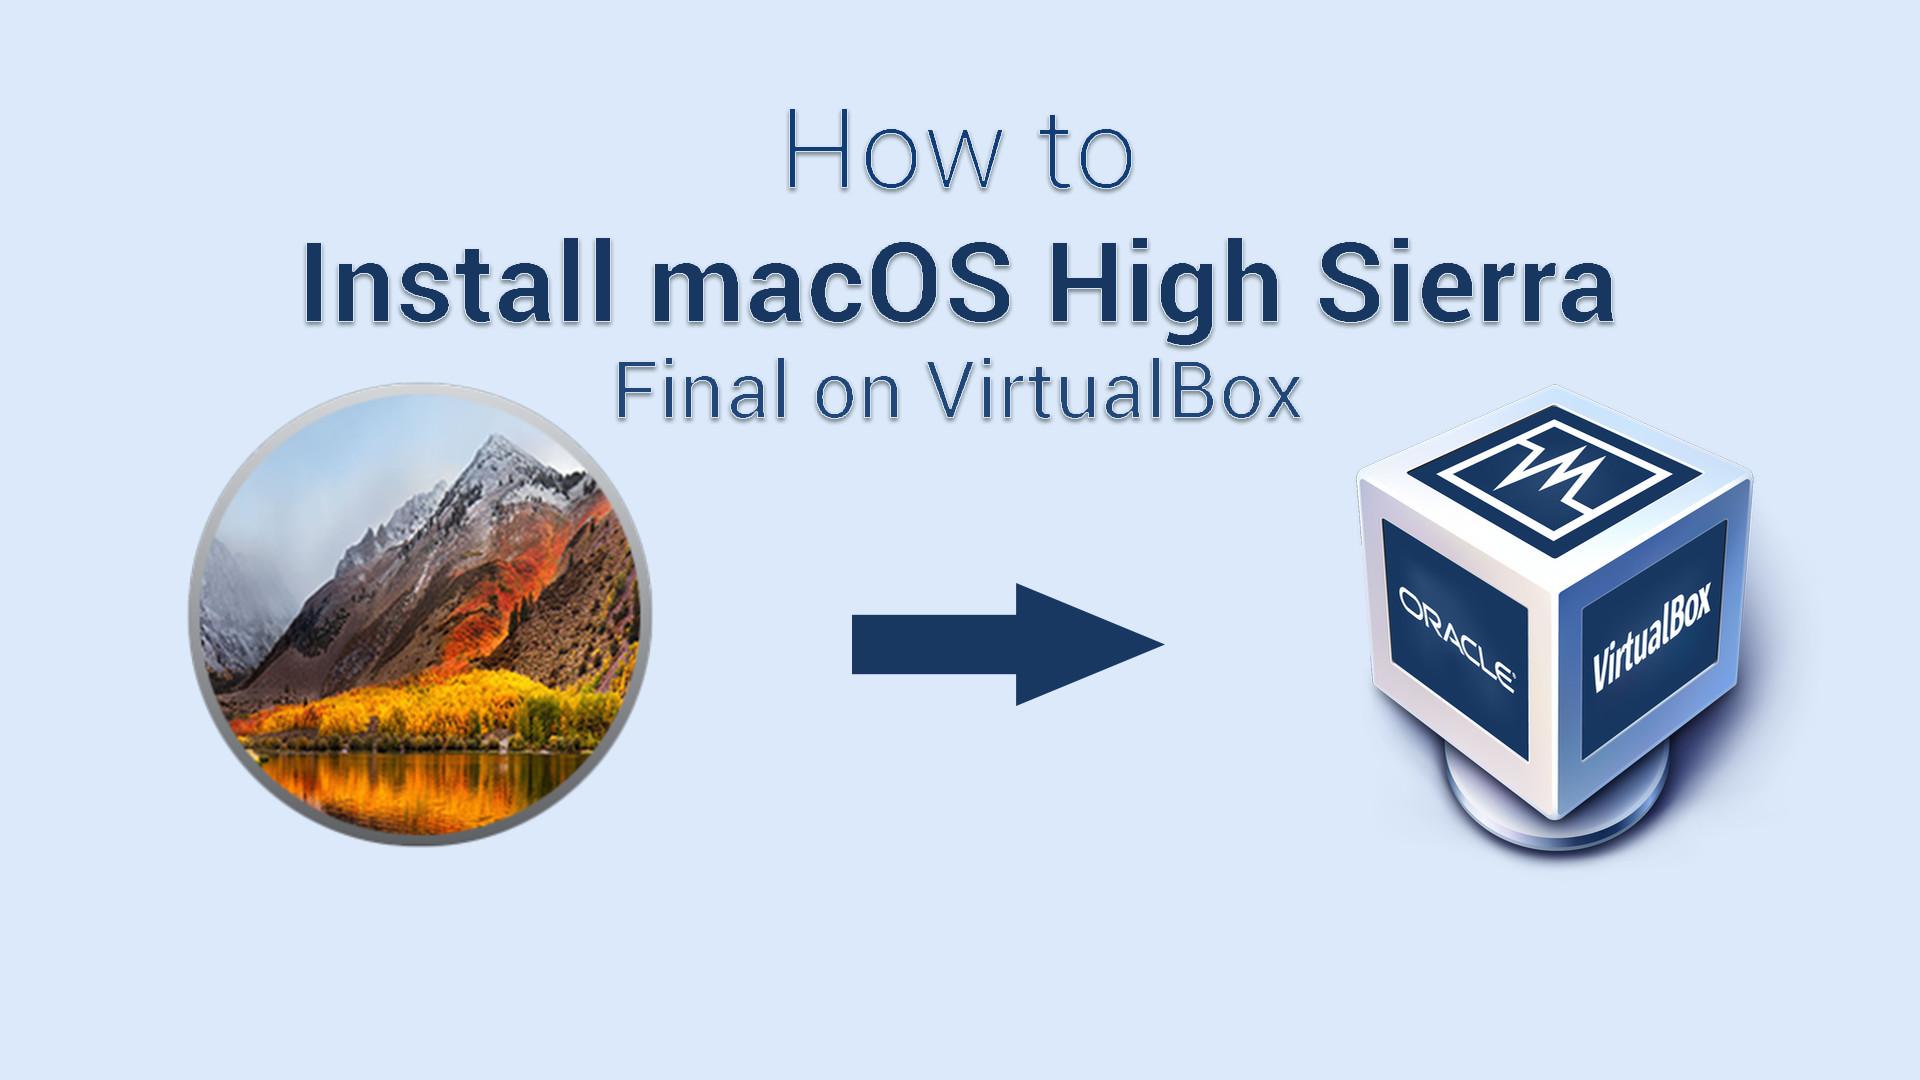 How to Install macOS High Sierra on VirtualBox on Windows 7/8/10 - PC